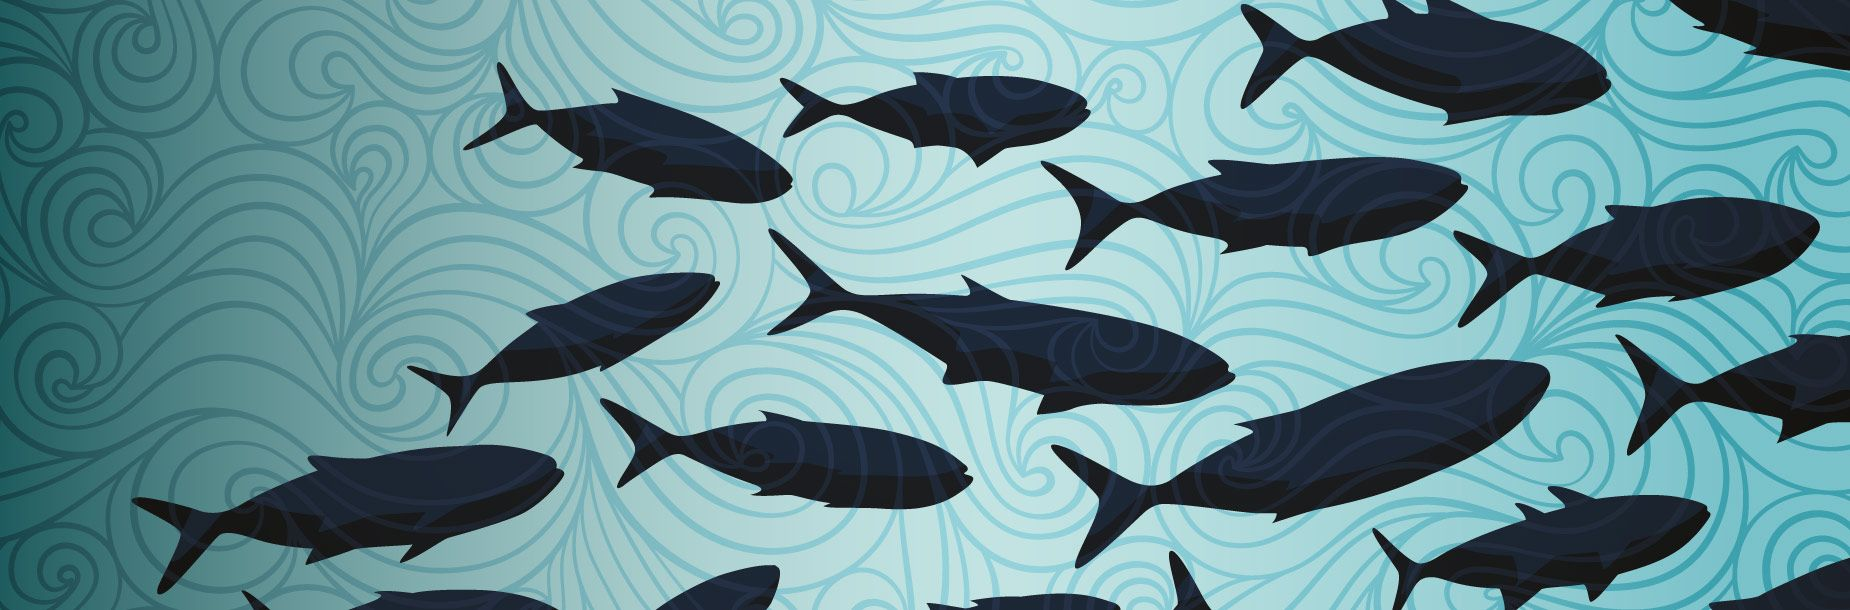 Economist Intelligence Unit reveals leaders and laggards on coastal governance